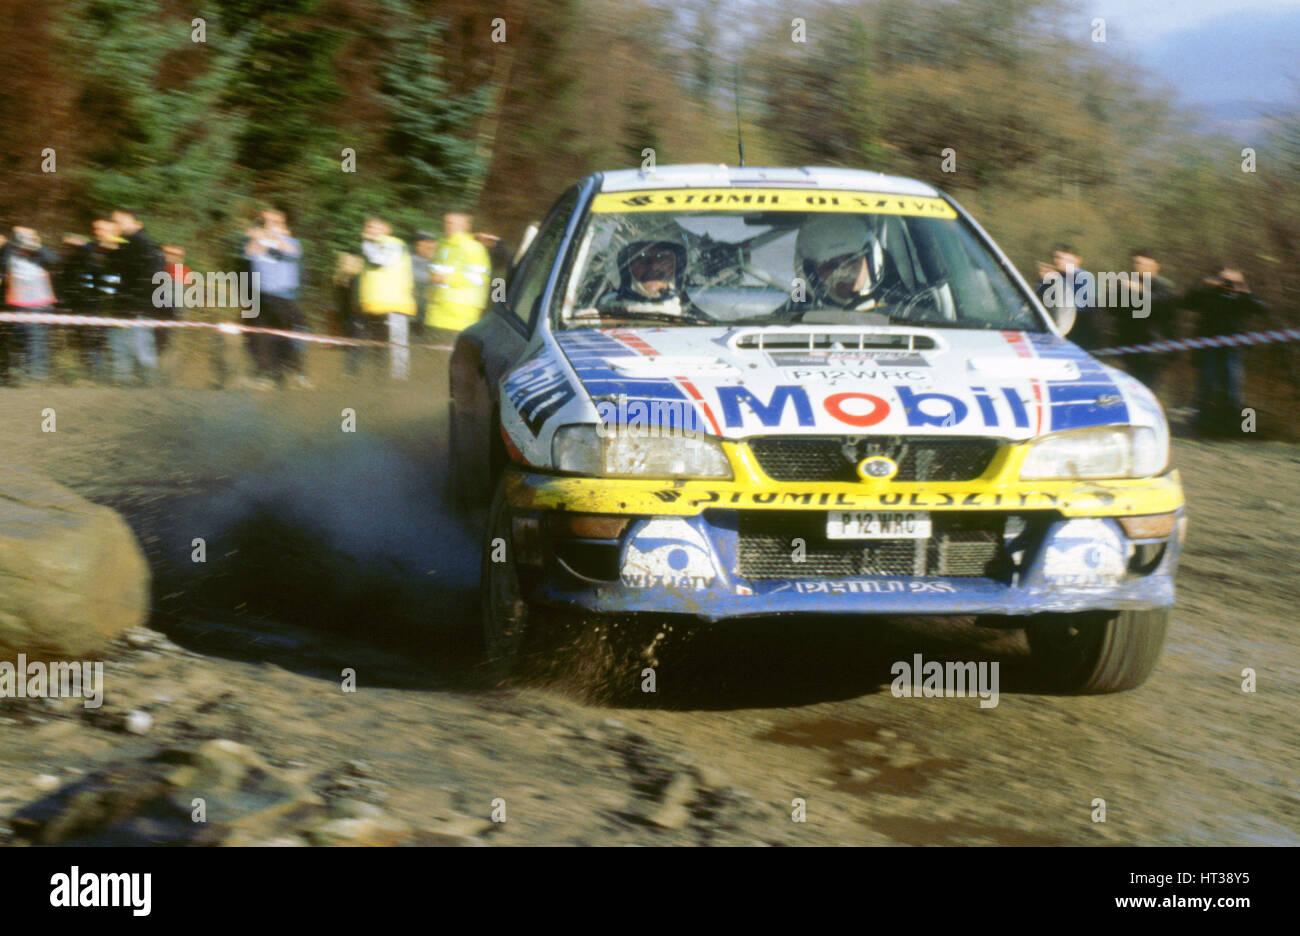 Subaru impreza wrc 1998 network Q rally. Artist: Unknown. - Stock Image